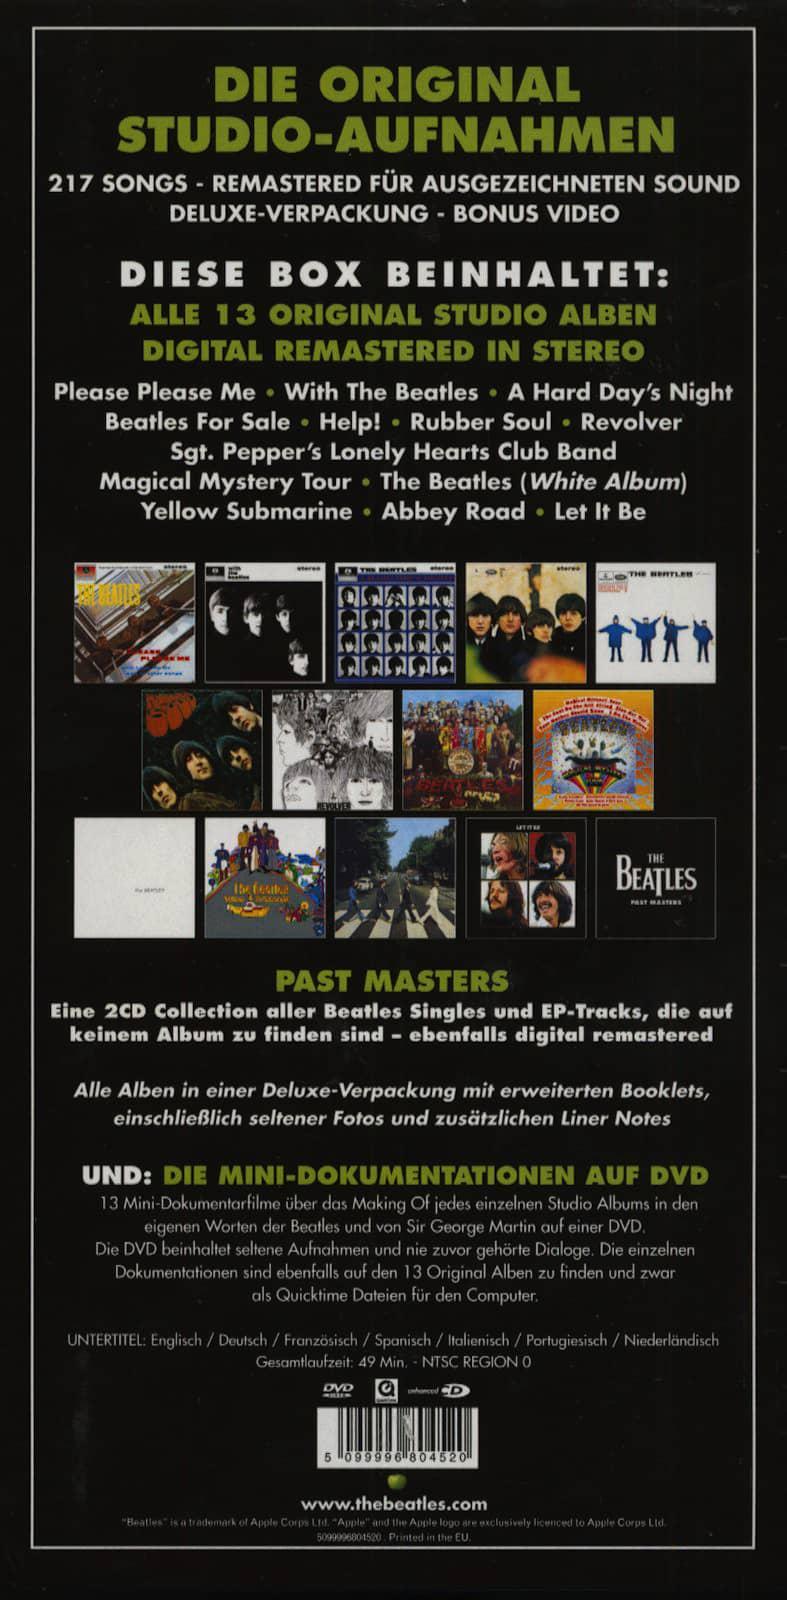 The Beatles CD: The Beatles - Stereo Box - Original Studio